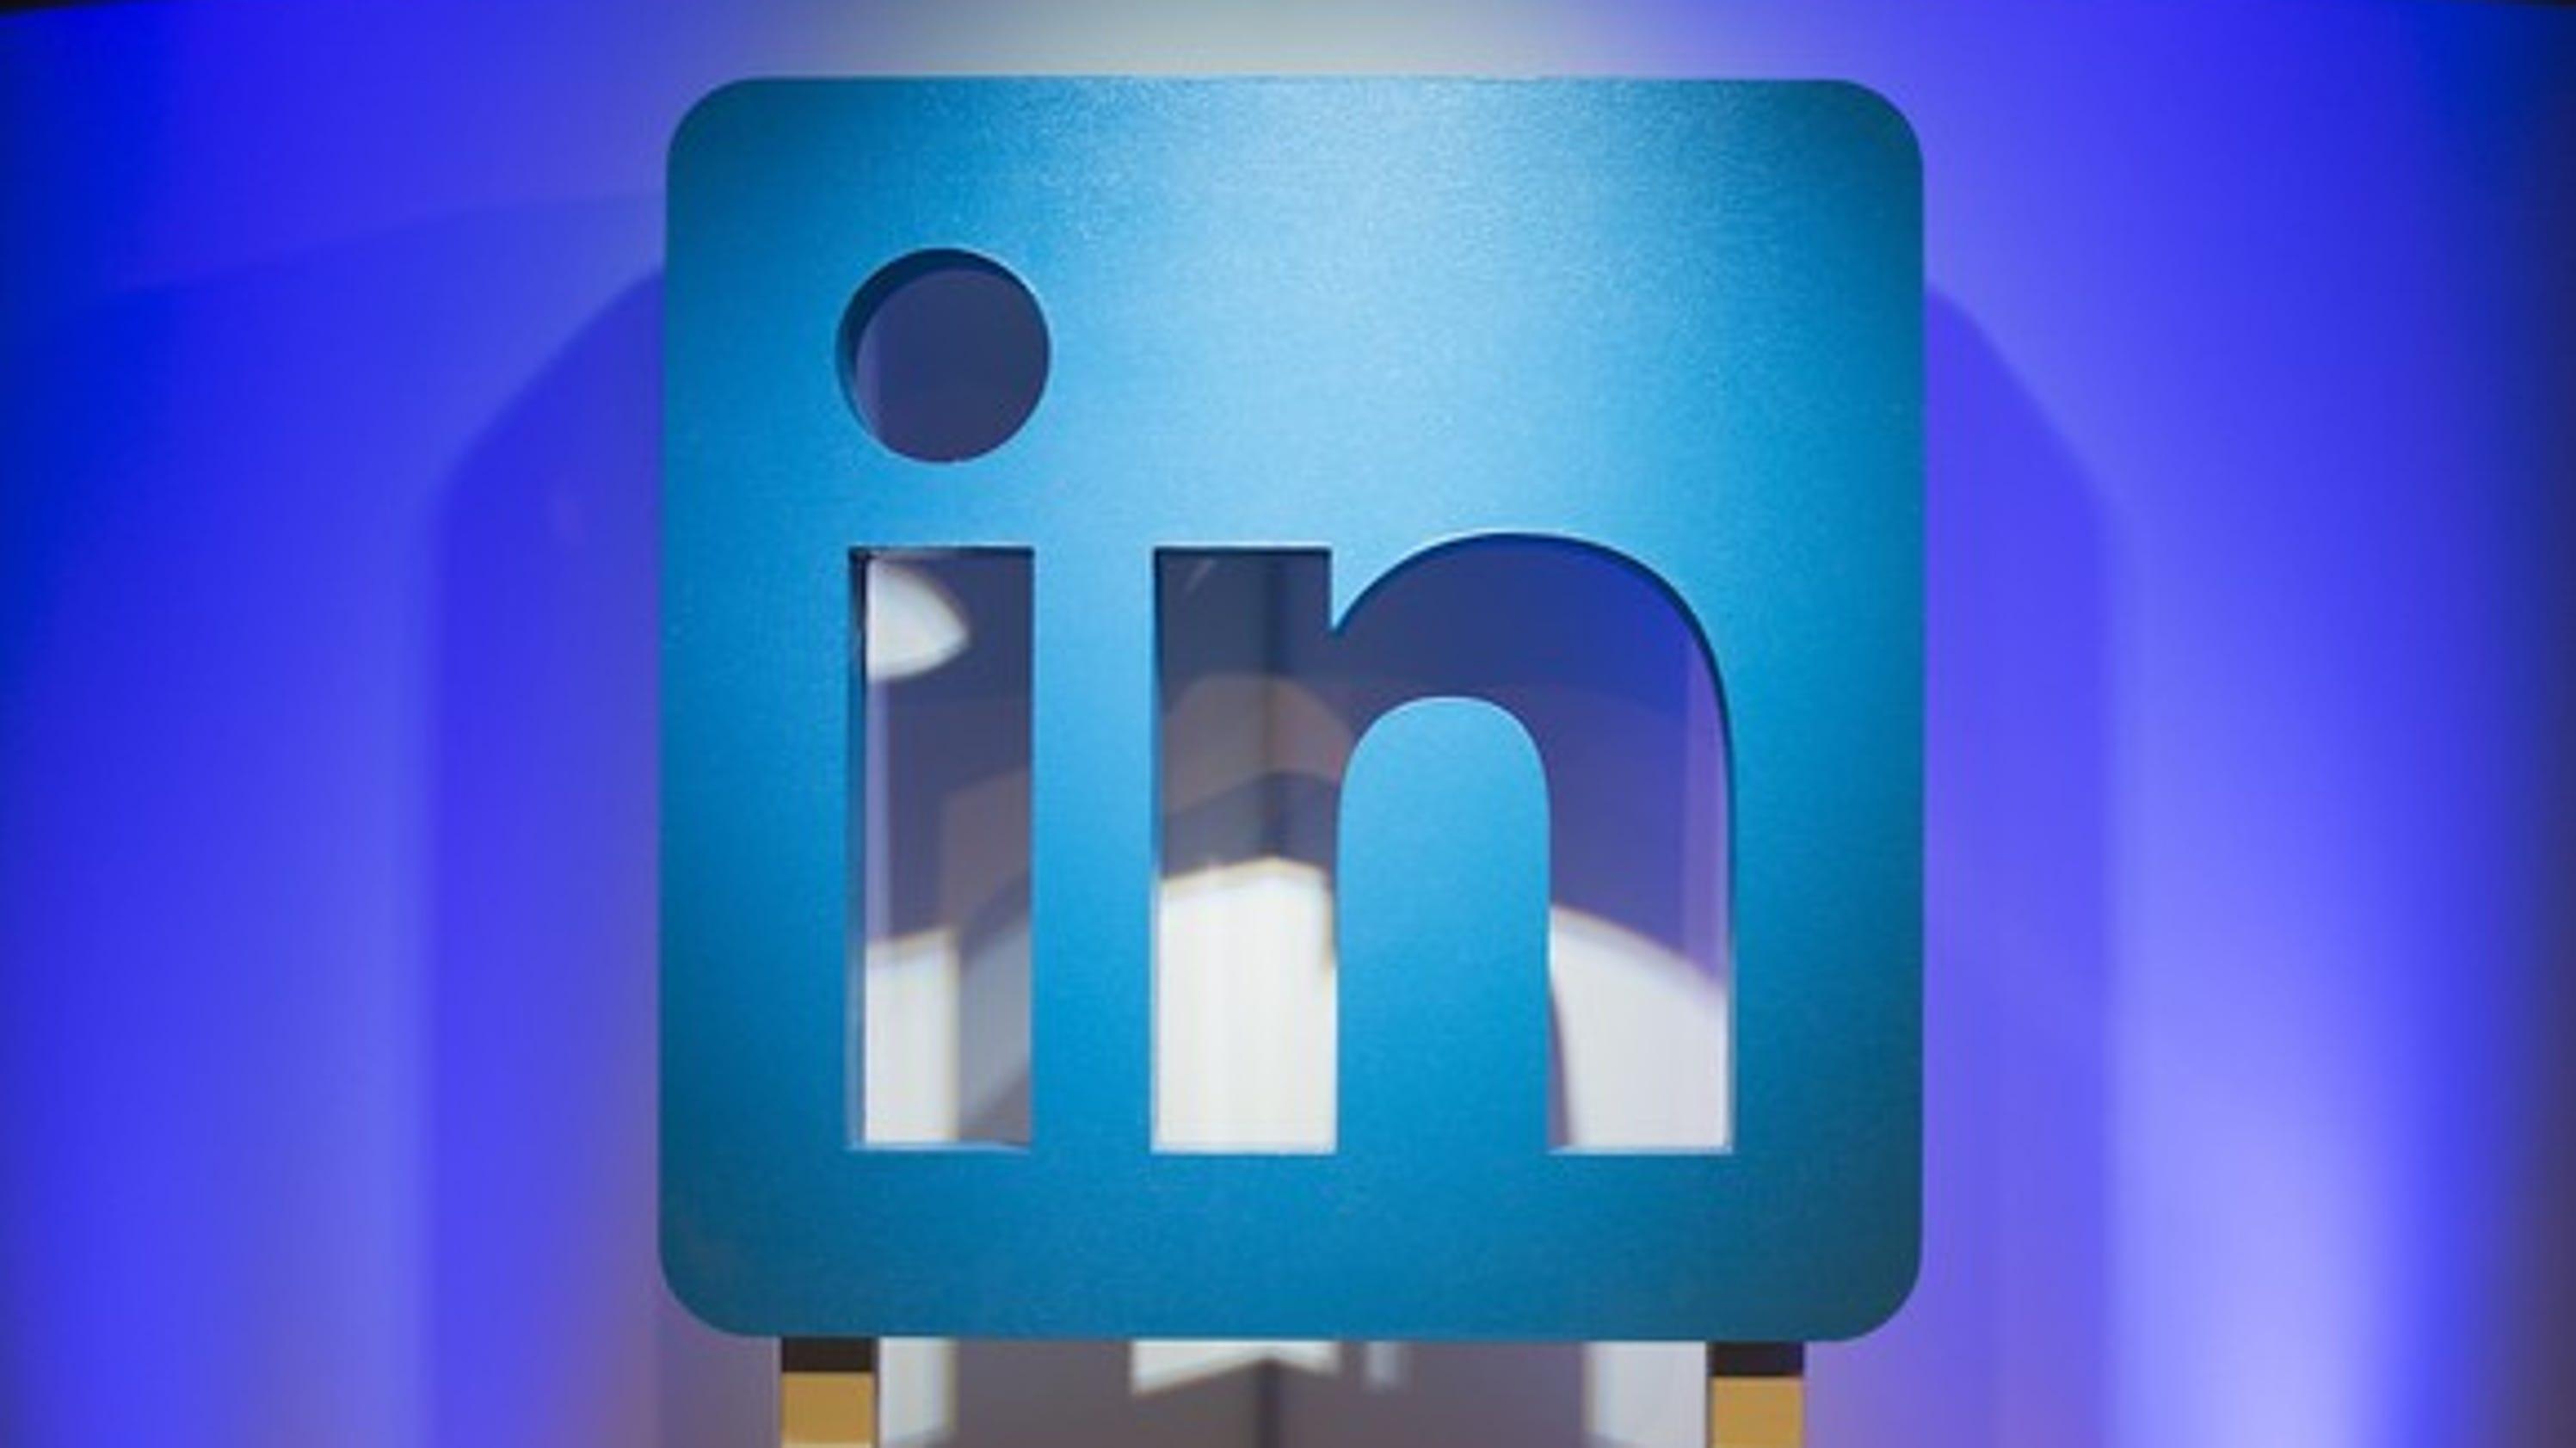 Berühmt Blauer Himmel Setzt Linkedin Fort Fotos - Entry Level Resume ...